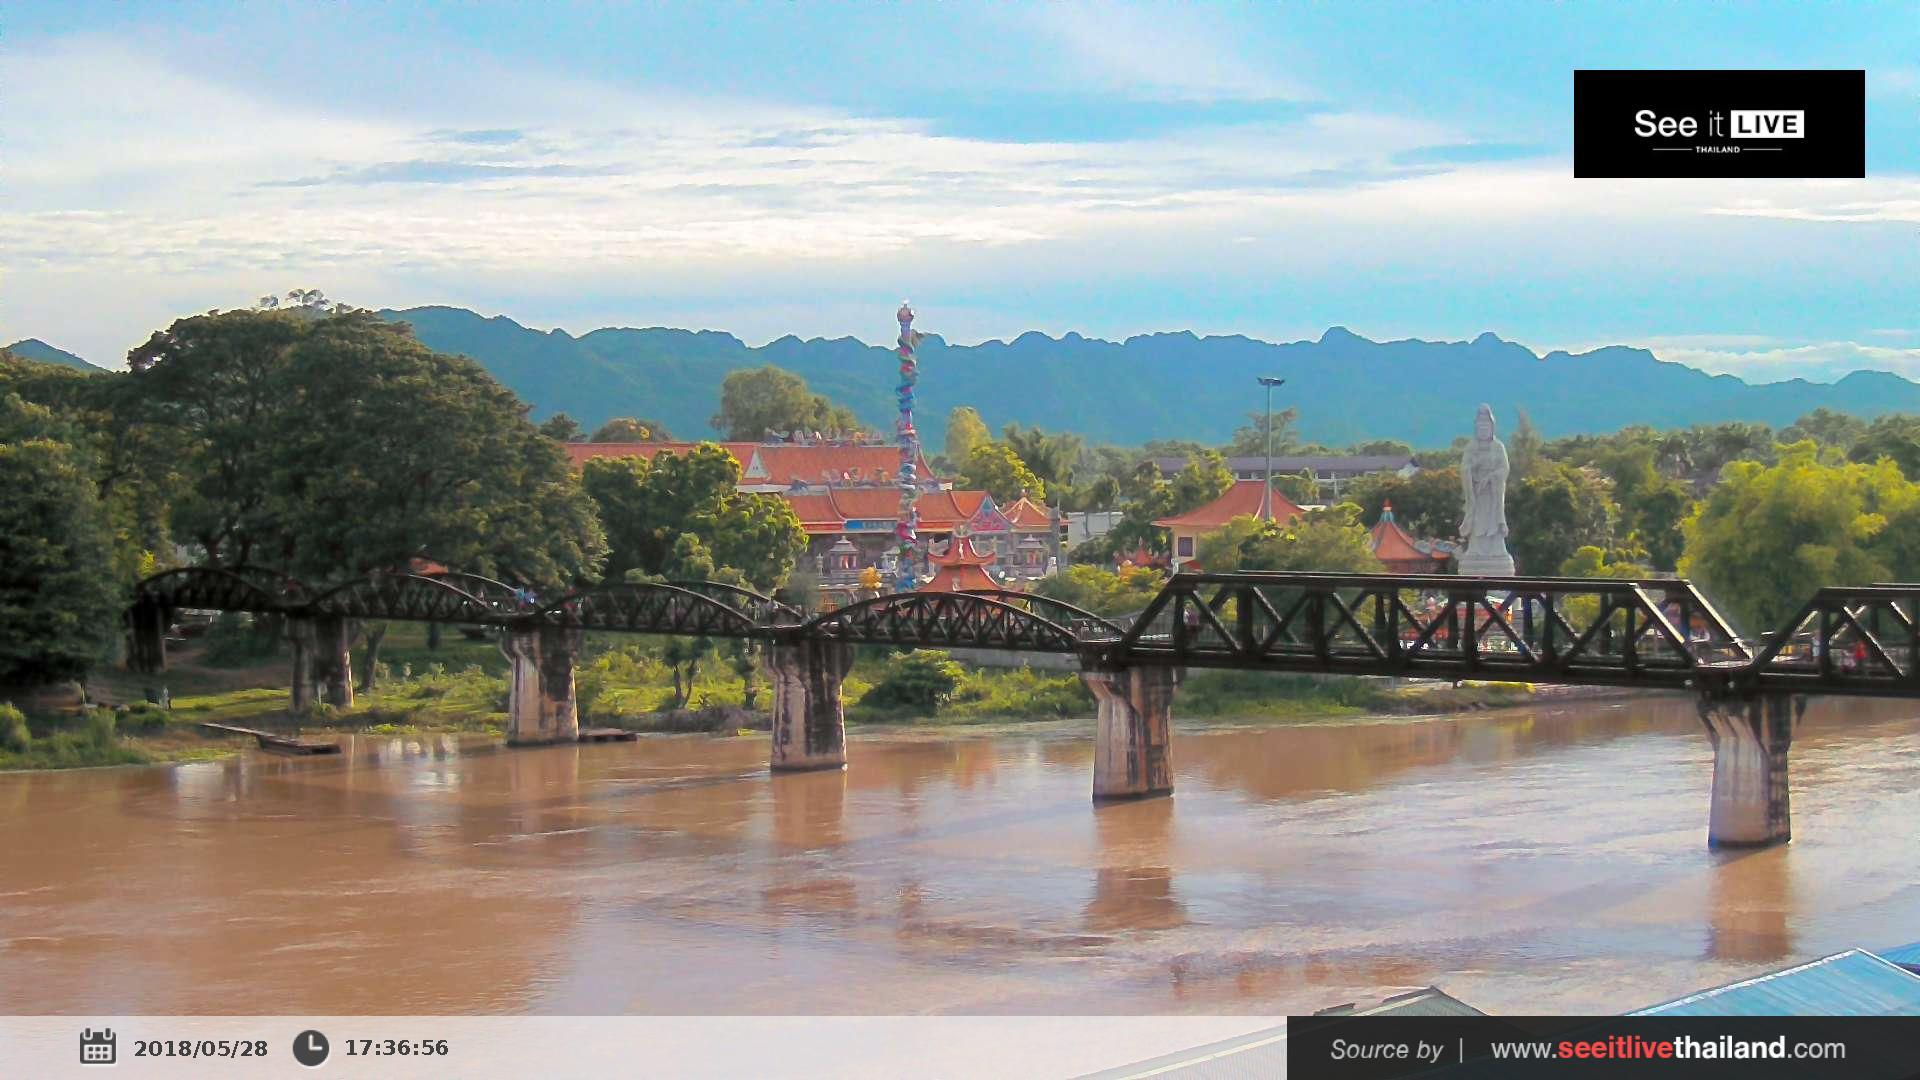 Webcam บ้านพฤกษากาญณ์: The Bridge of The River Kwai